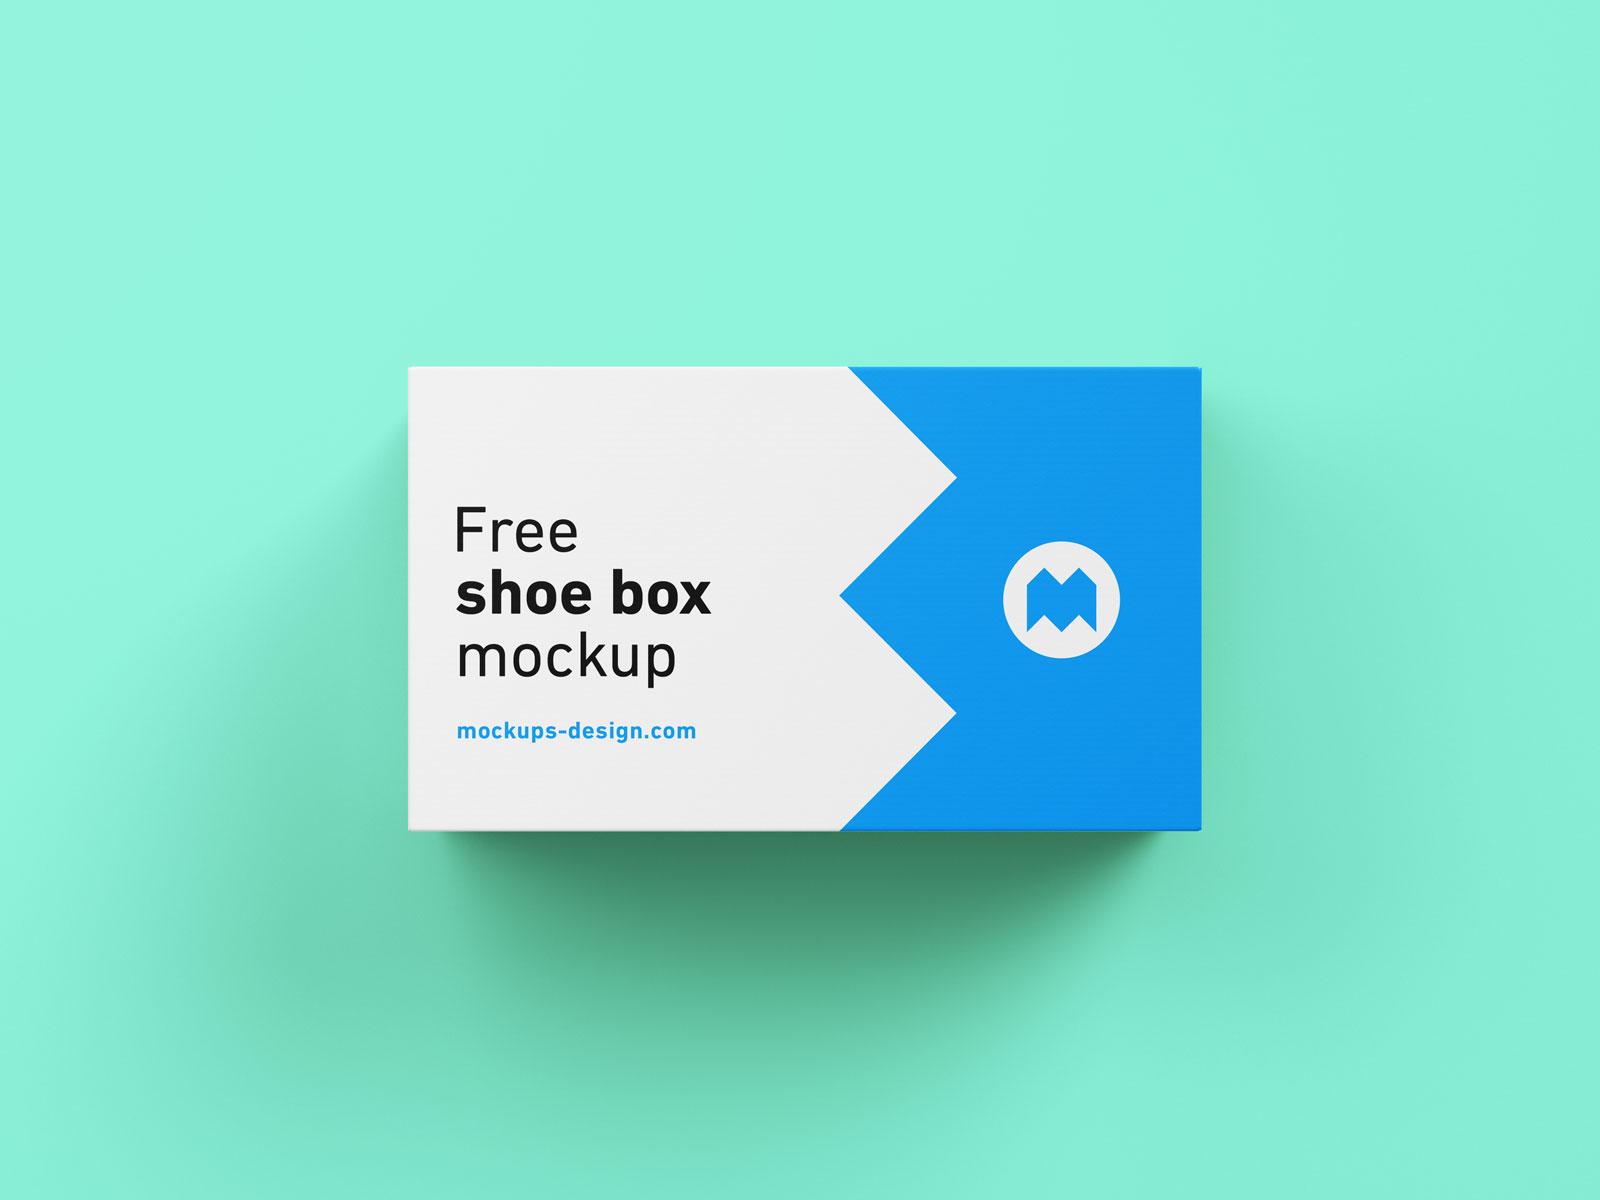 Free-Show-Box-Mockup-PSD-File-3